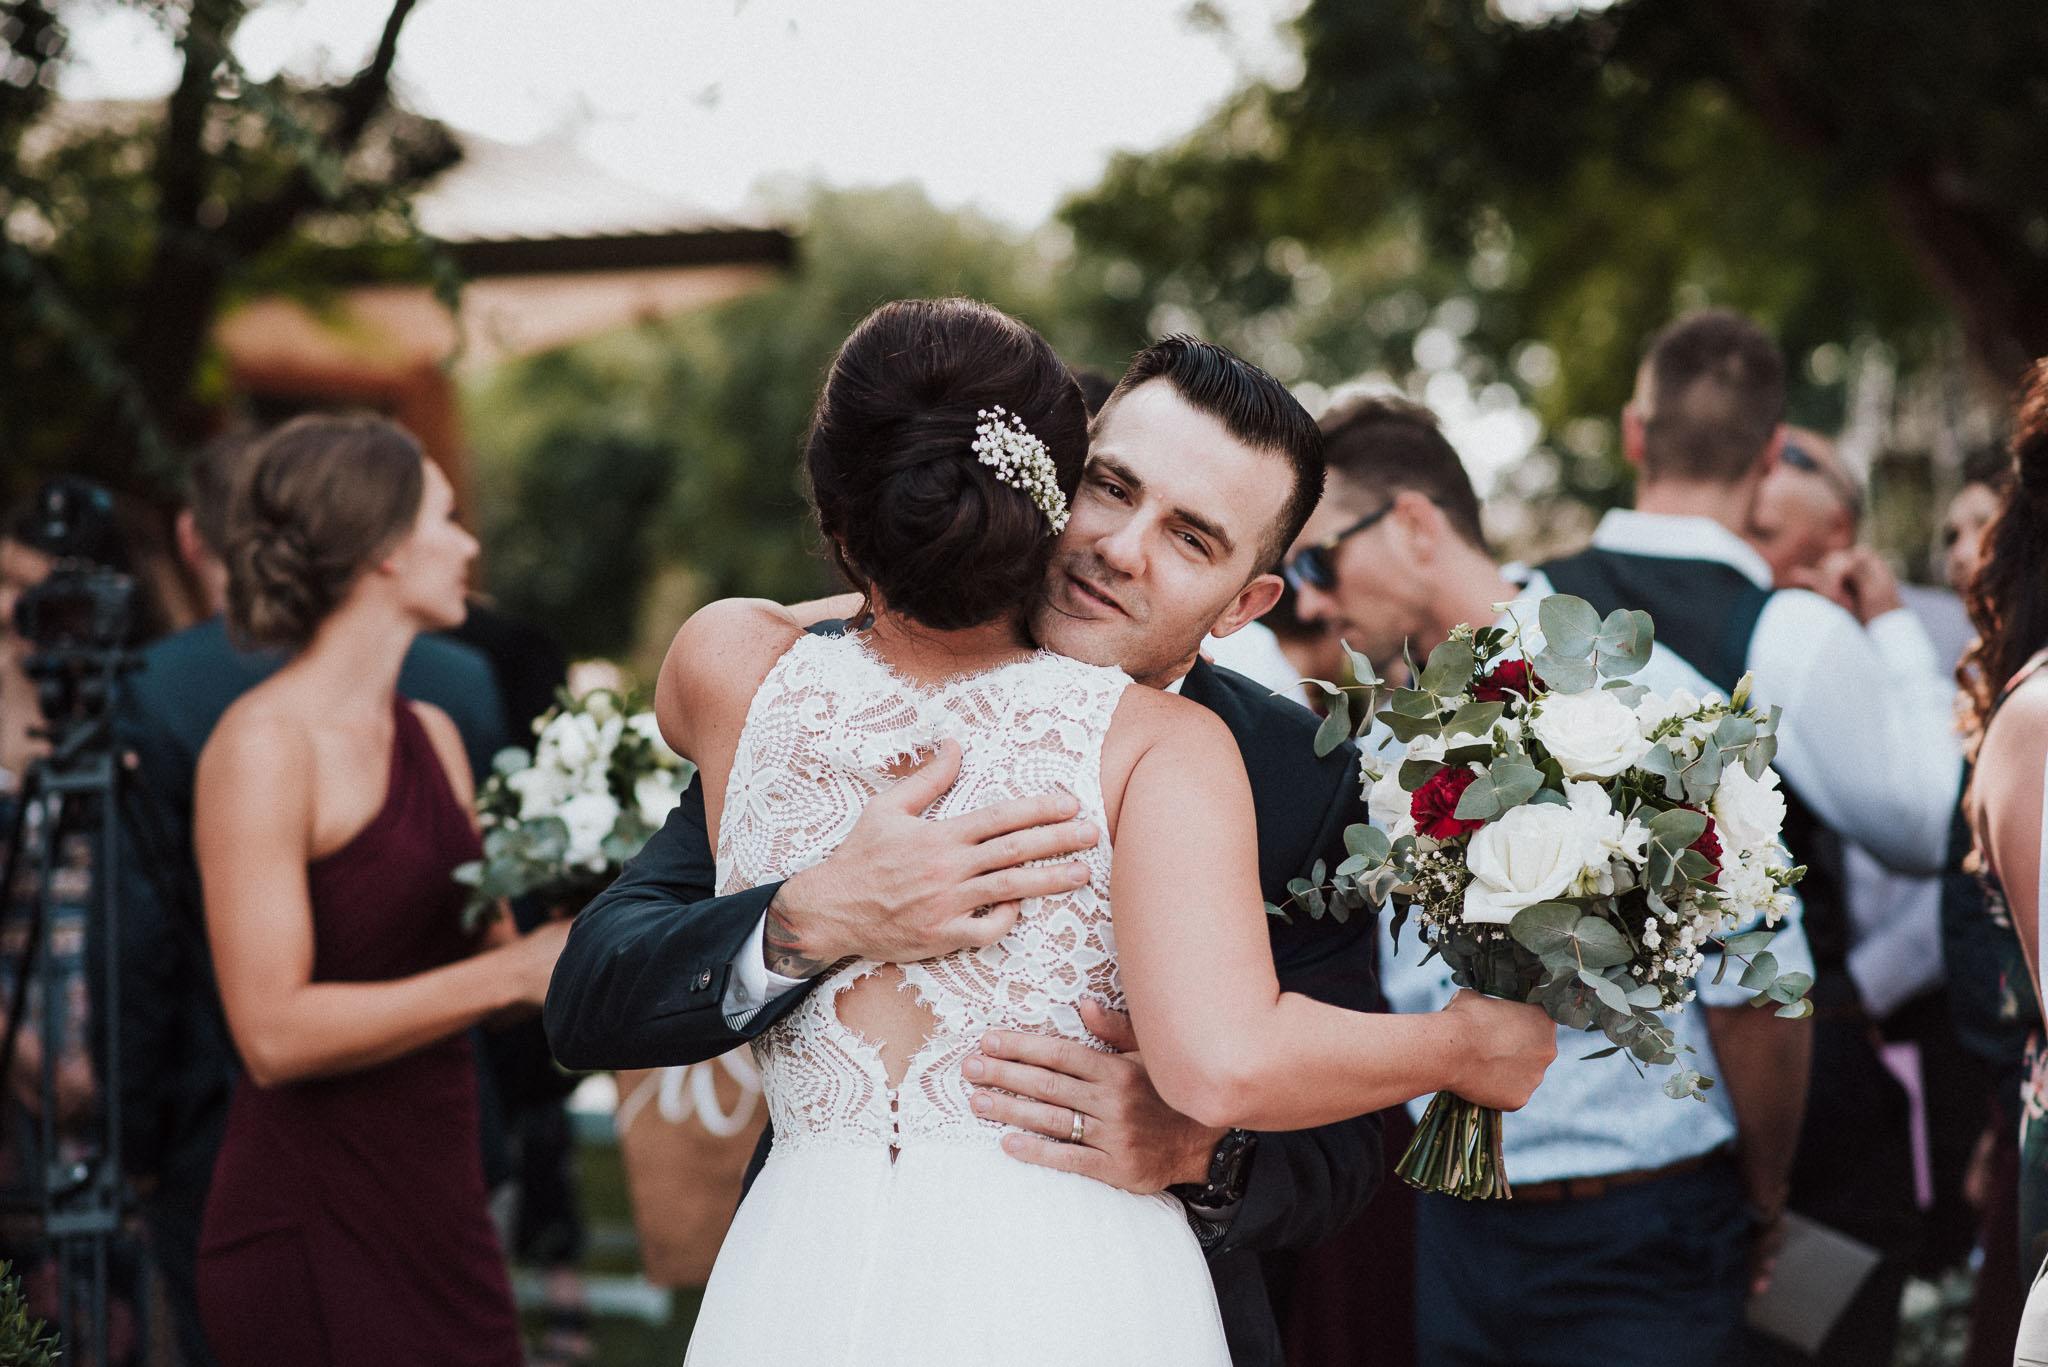 MECURE-RESORT-WEDDING-KING-WEB-131.jpg